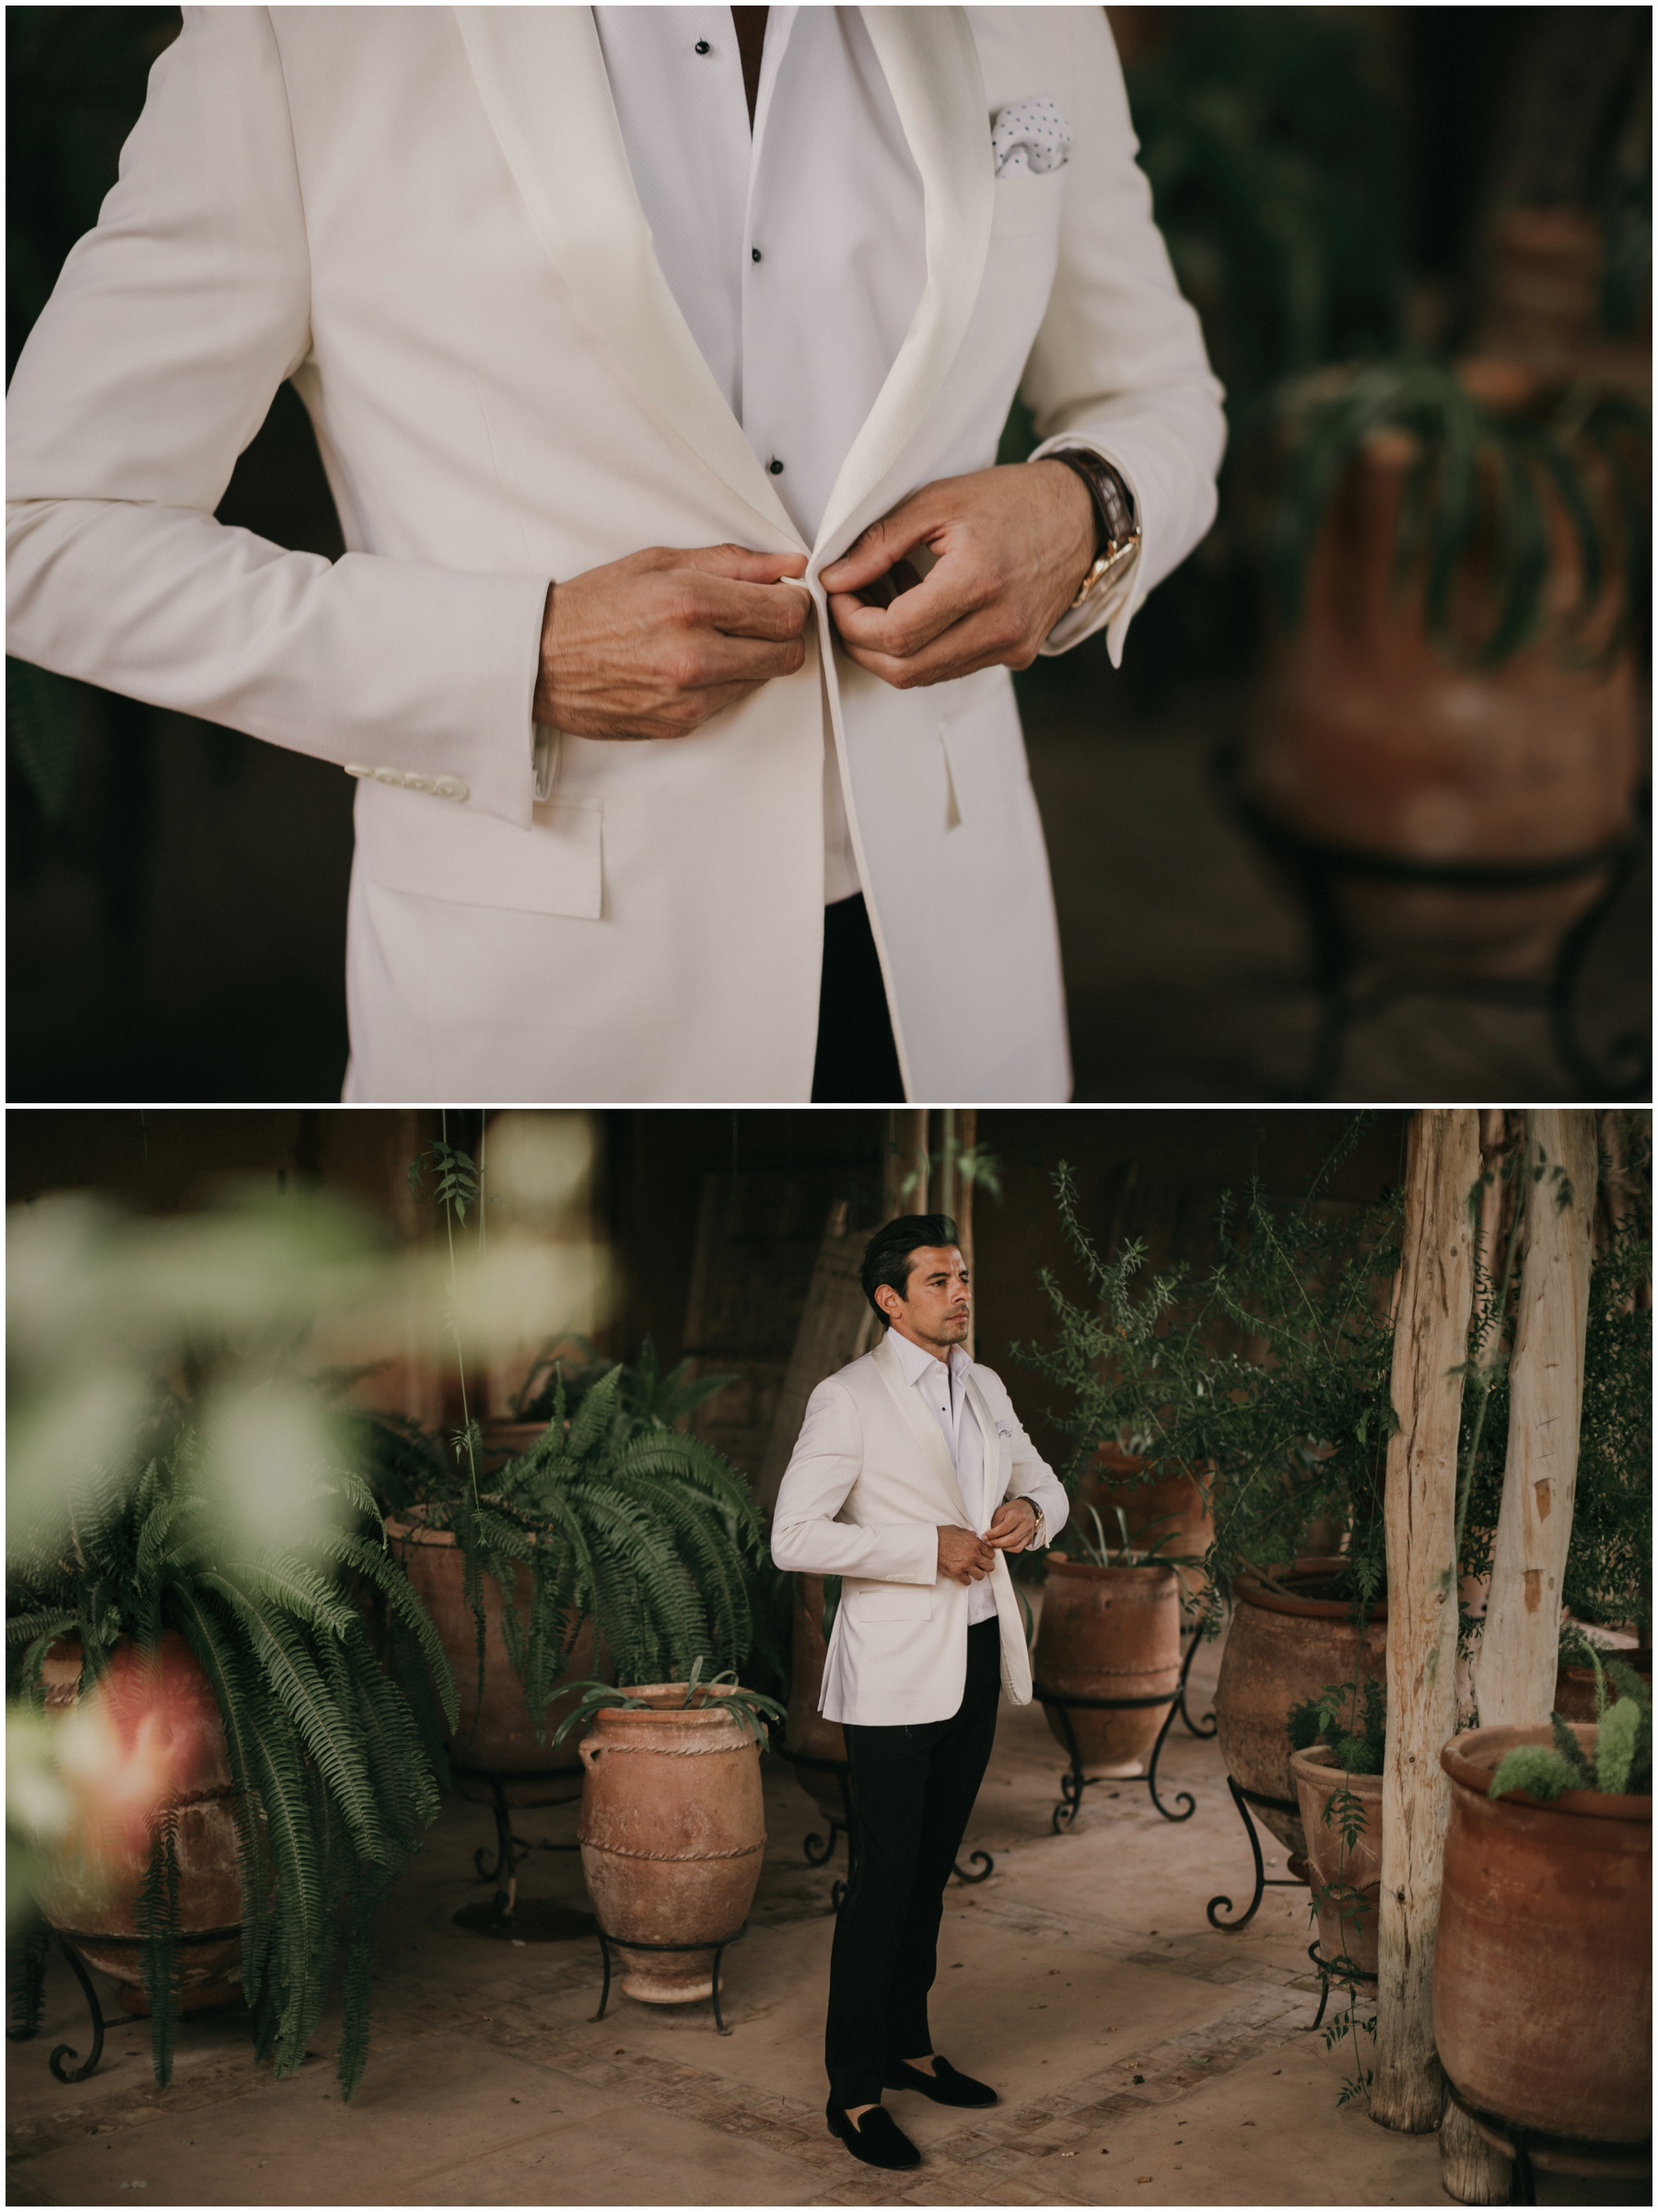 Marrakech Wedding Beldi Coutry Club 010.JPG